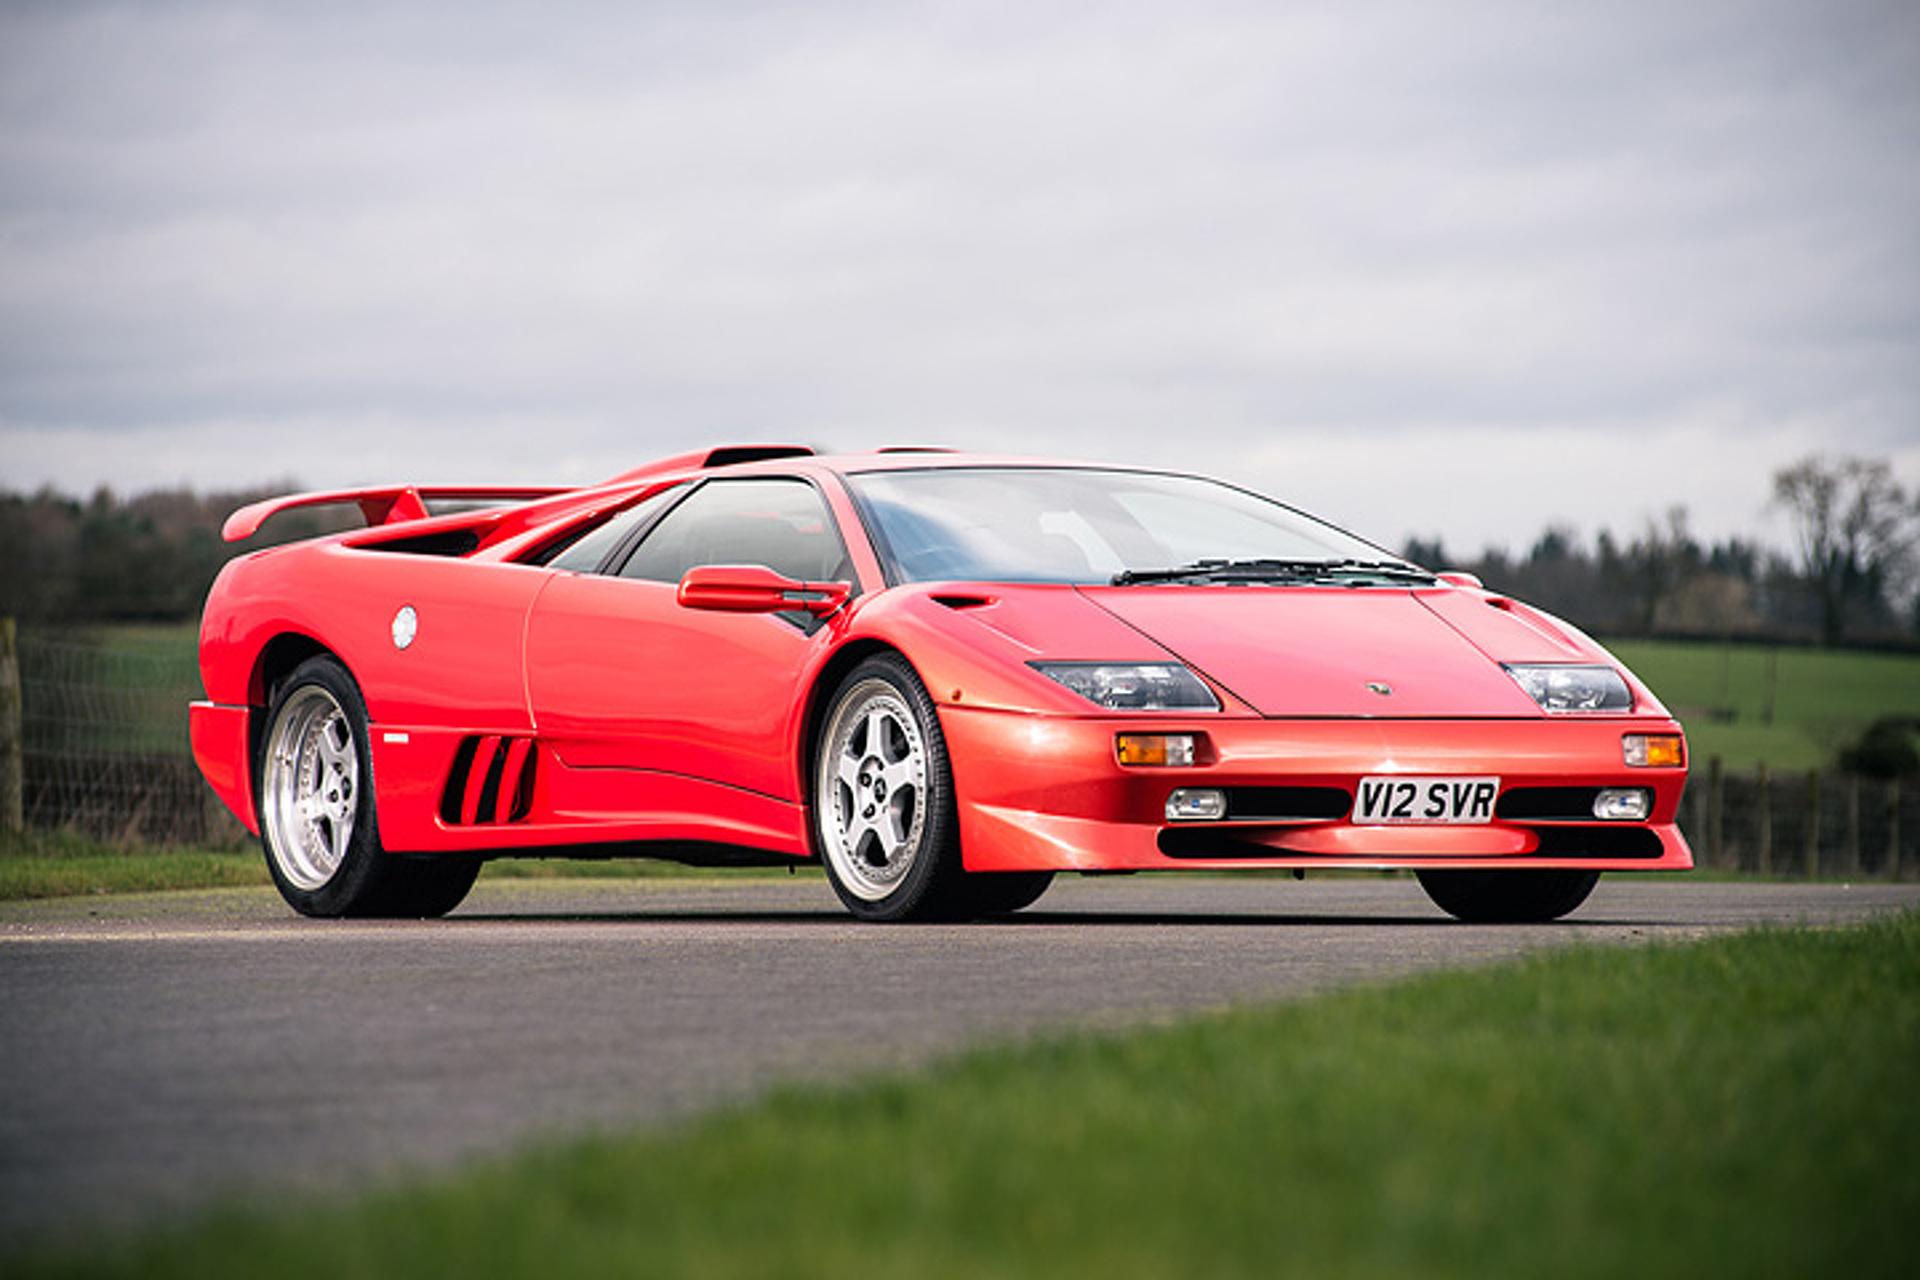 7 Classic Cars That Deserve a Hellcat Engine Swap